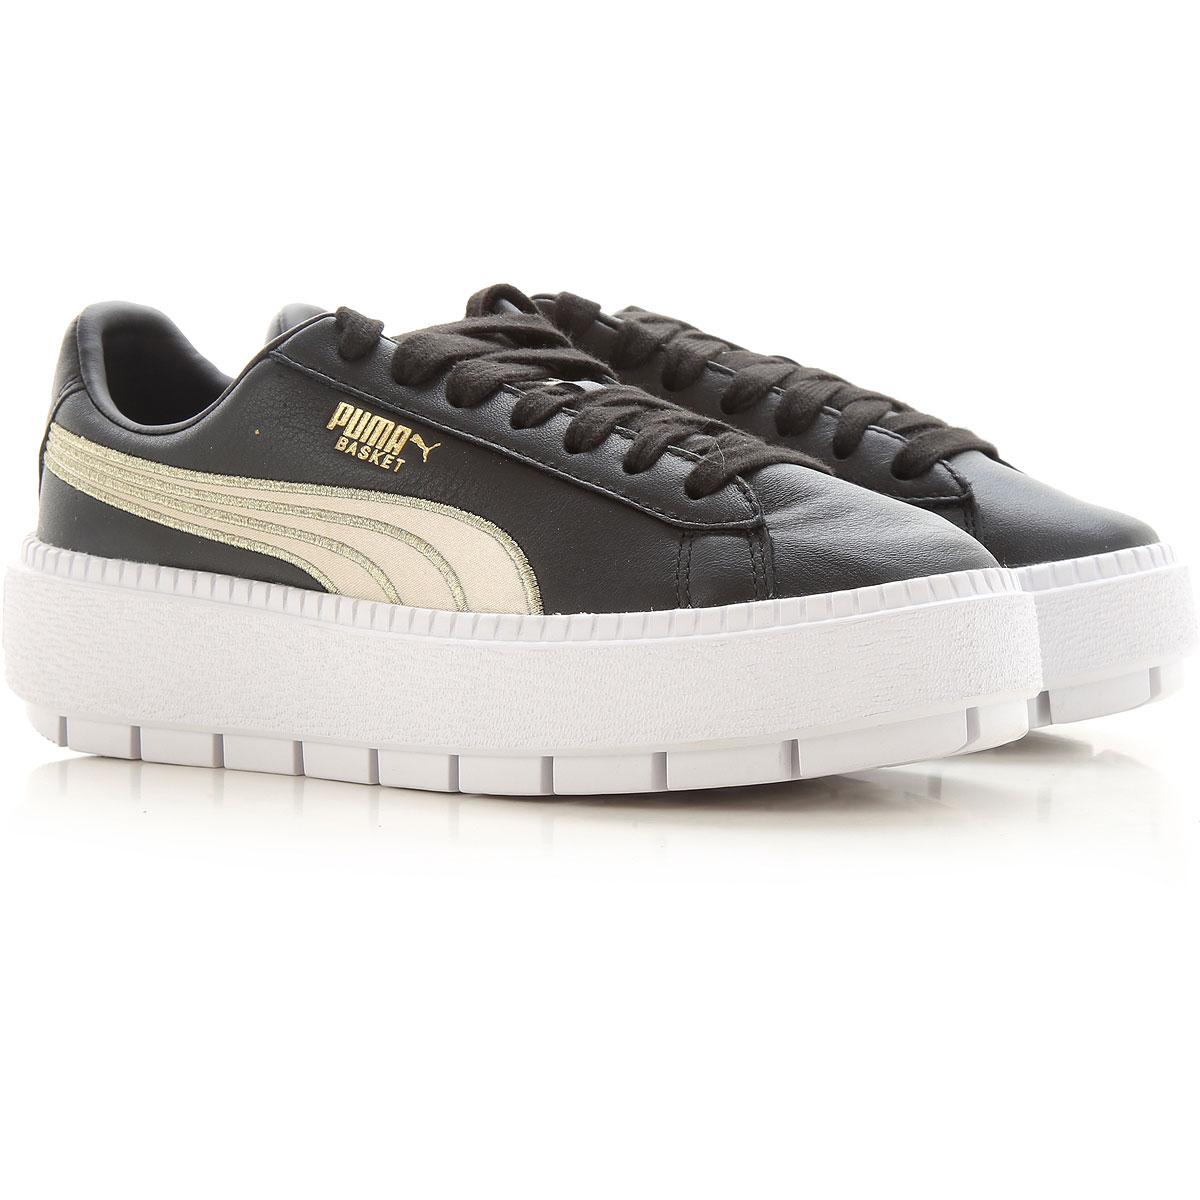 Puma Sneakers for Women On Sale in Outlet, Black, Leather, 2019, US 6 5 - UK 4 - EU 37 - JP 23 US 7 5 - UK 5 - EU 38 - JP 24 USA 9 - EUR 40